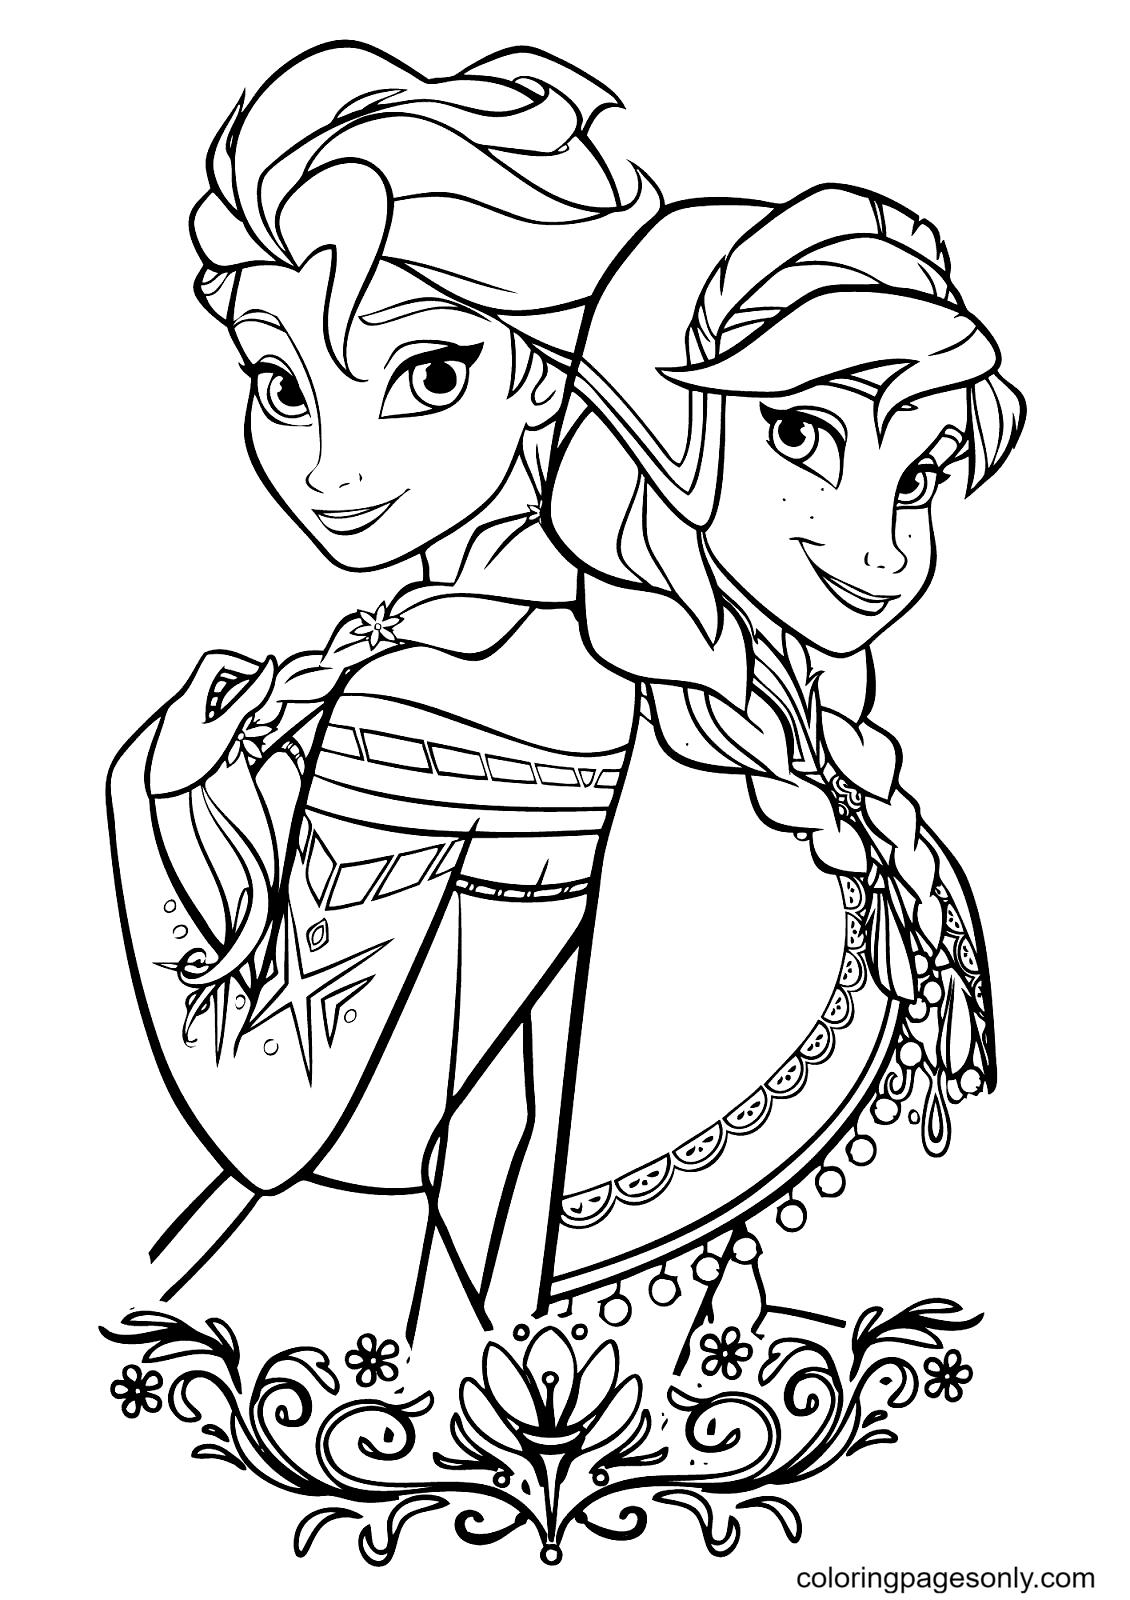 Disney Frozen Elsa, Anna Coloring Page